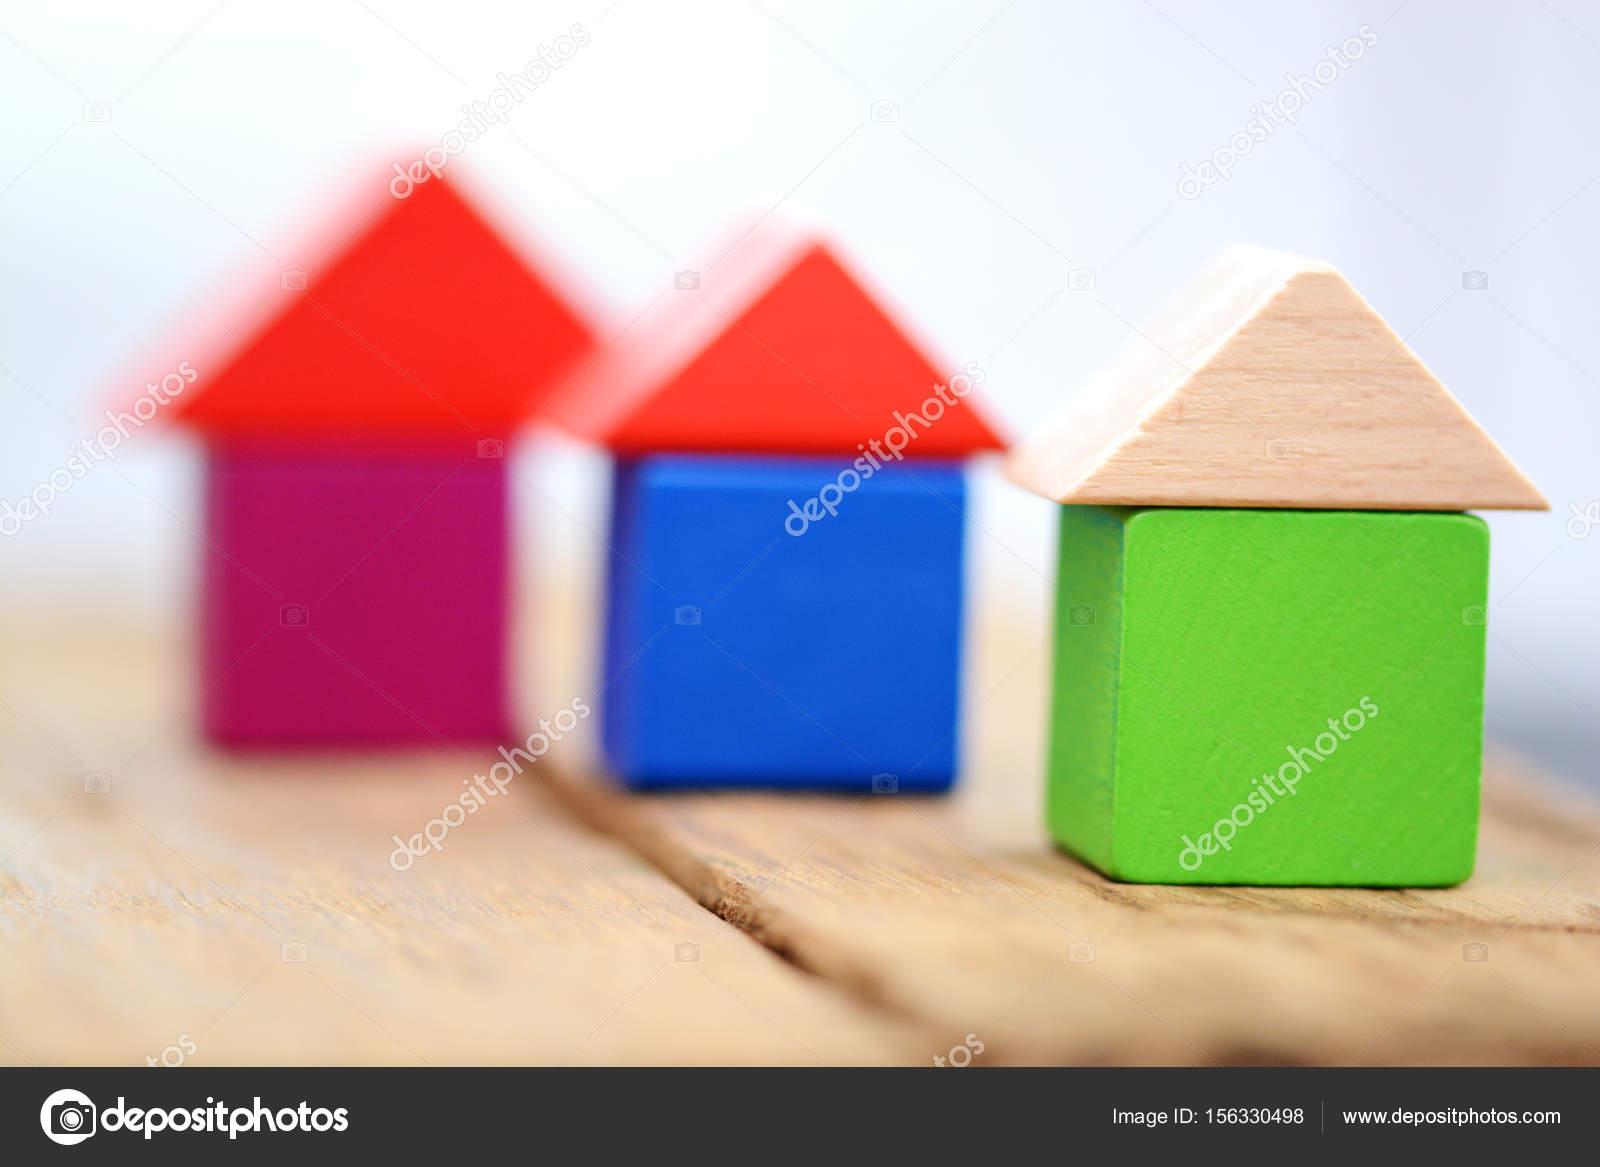 ef53d6737c1e Έννοια σπιτιών διακοπών με πολύχρωμα σπίτια από ξύλινα κυβάκια — Εικόνα από  ...